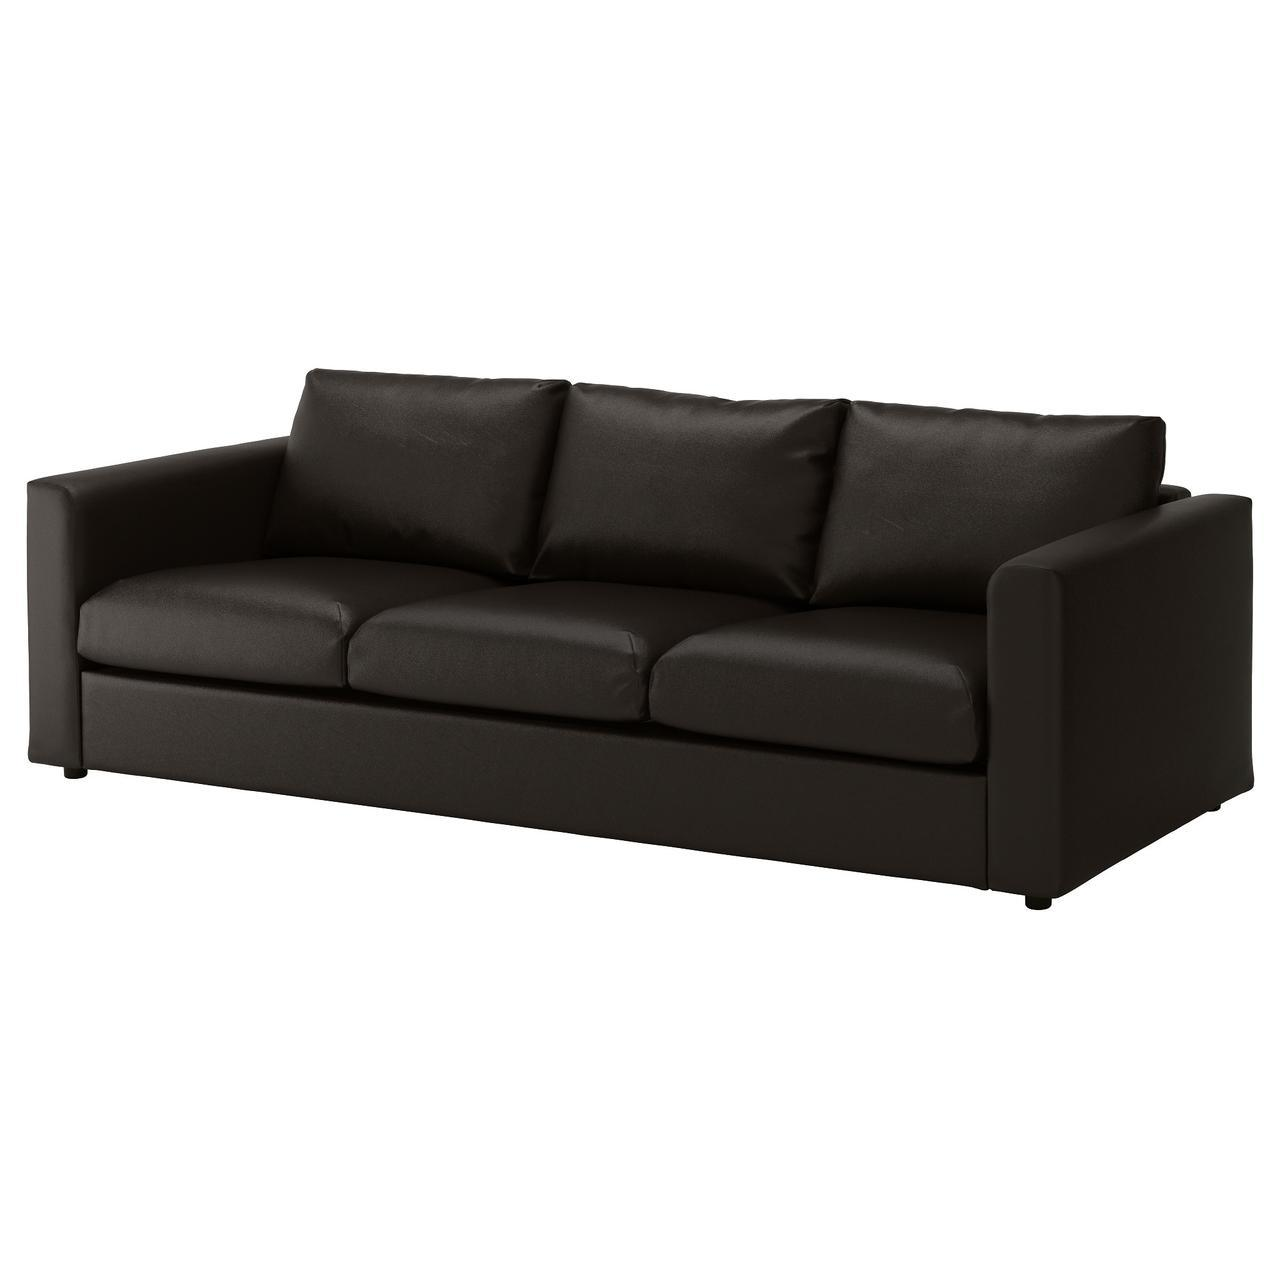 IKEA VIMLE (092.068.84) Трехместный диван, Farsta, темно-синий